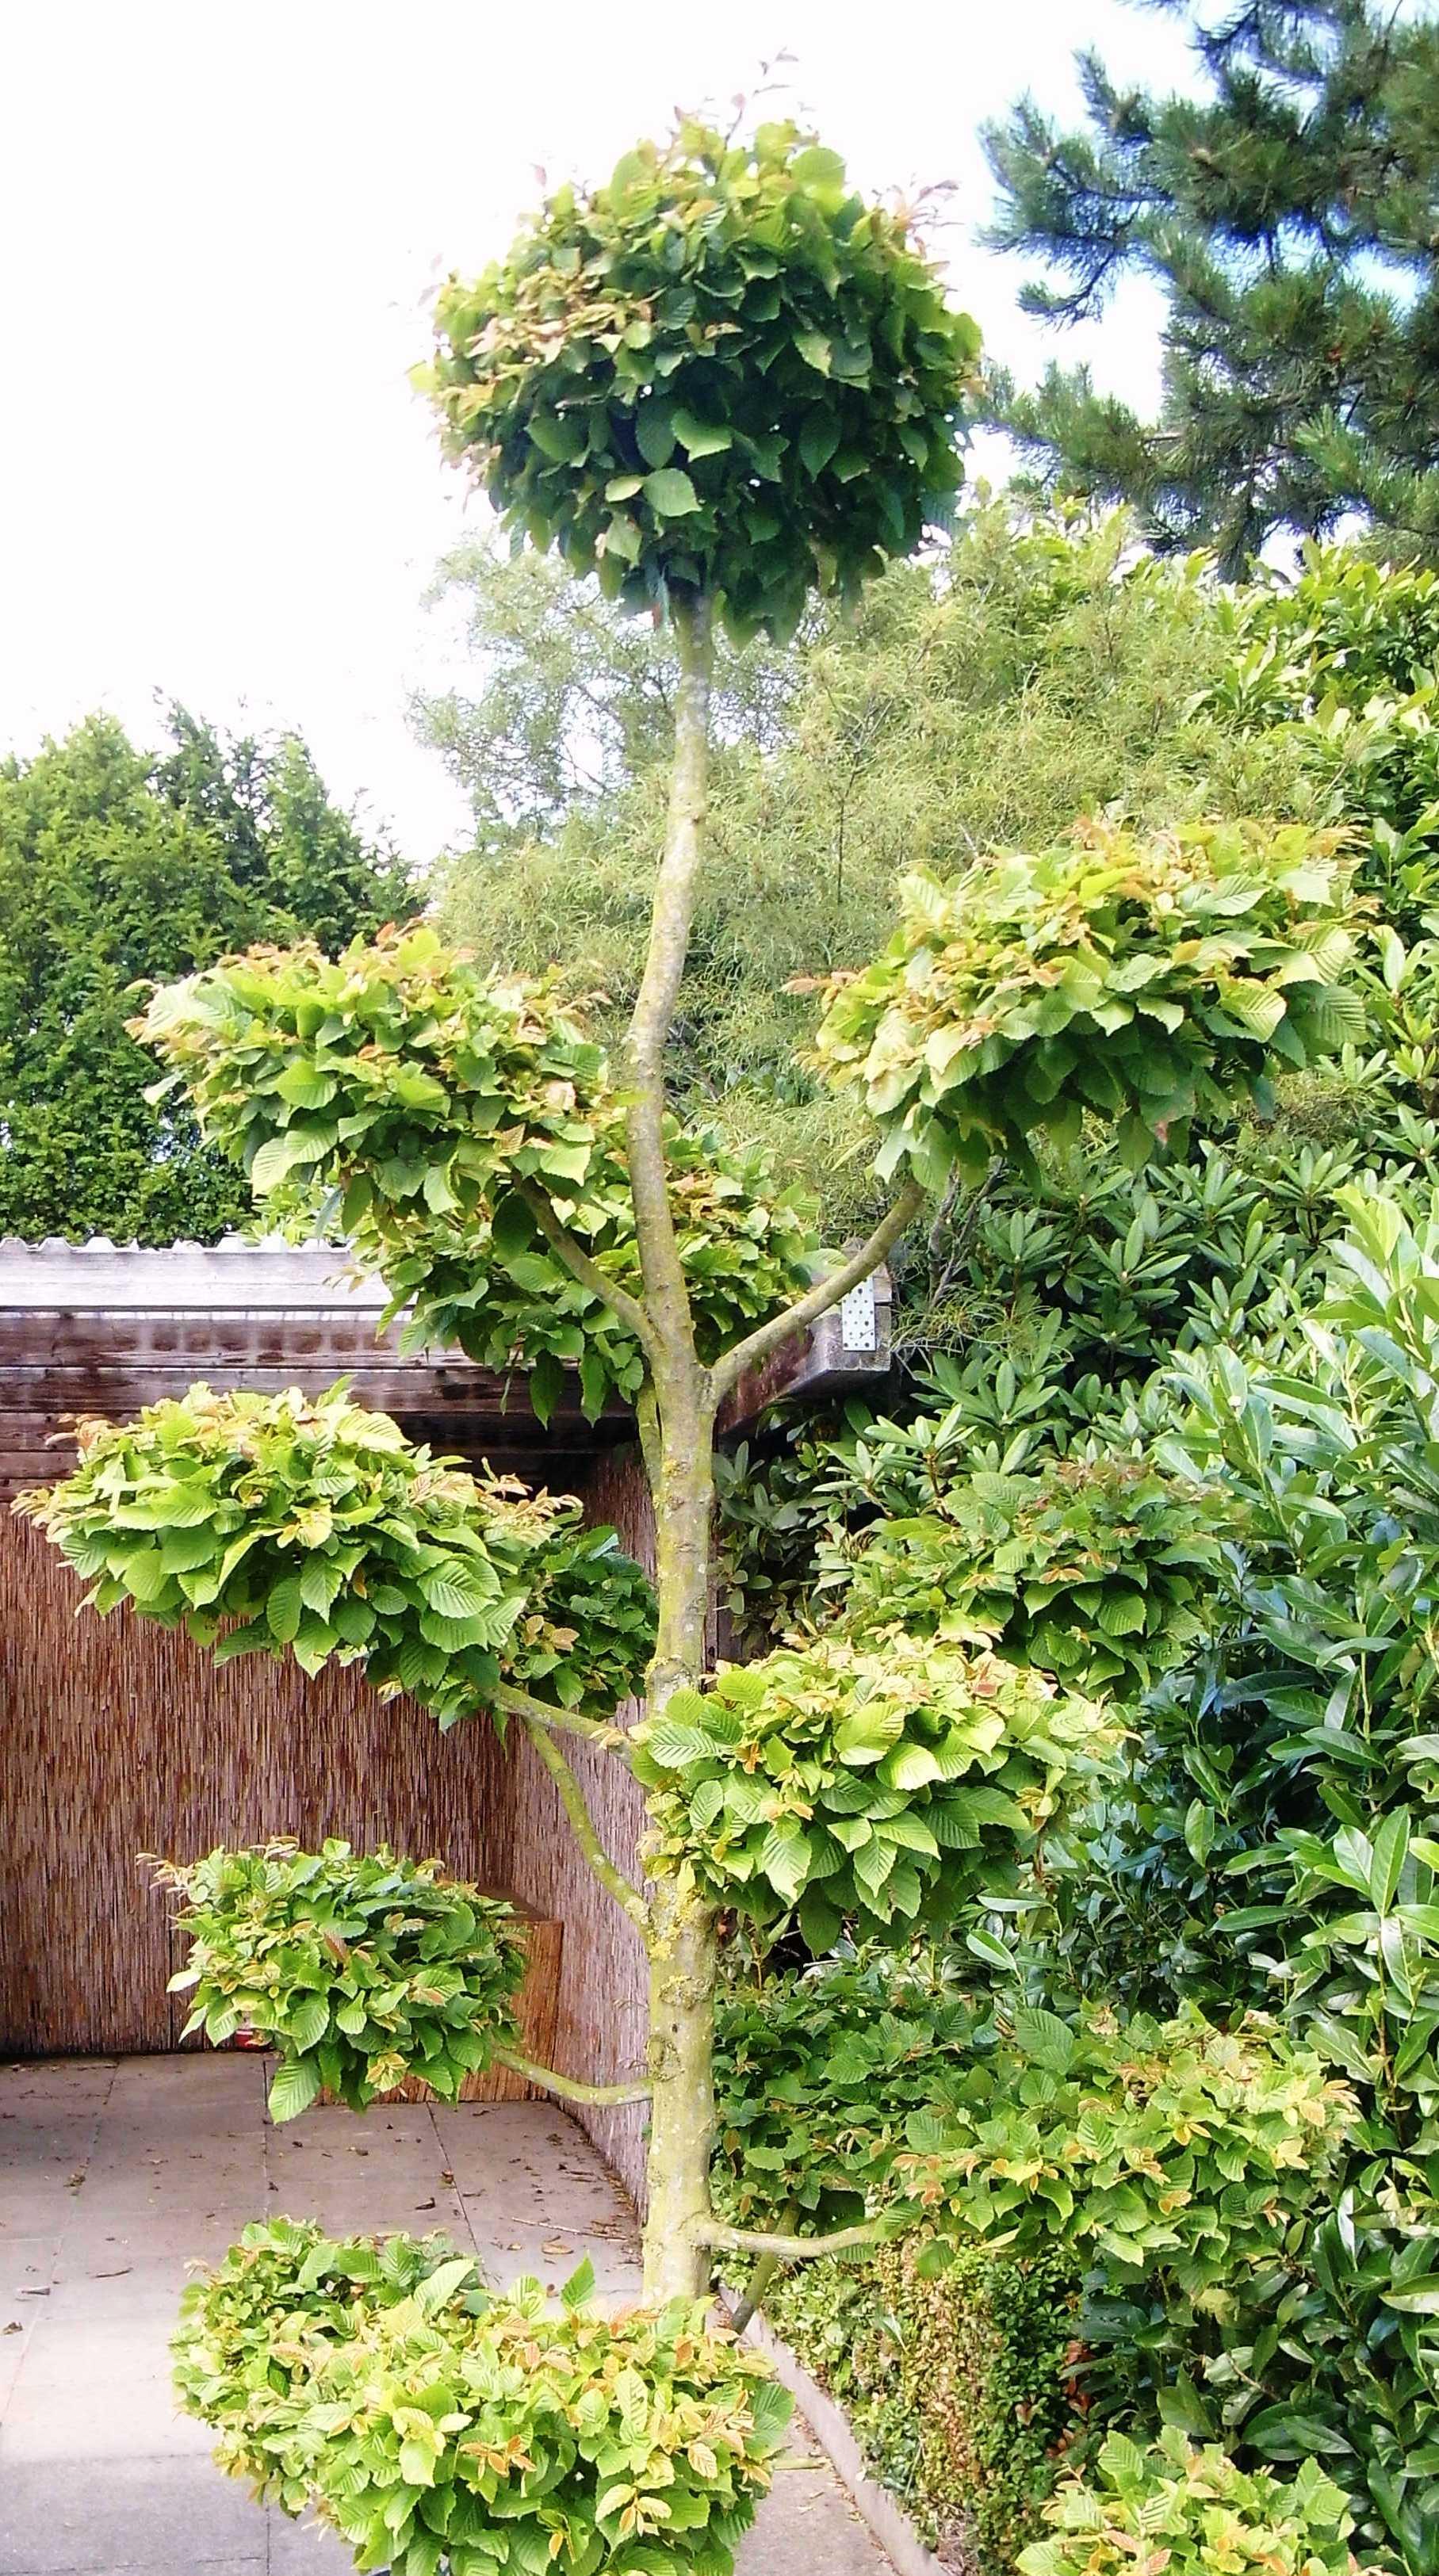 hainbuche wei buche carpinus betulus bonsai olaf ramcke pflanzenhandel. Black Bedroom Furniture Sets. Home Design Ideas